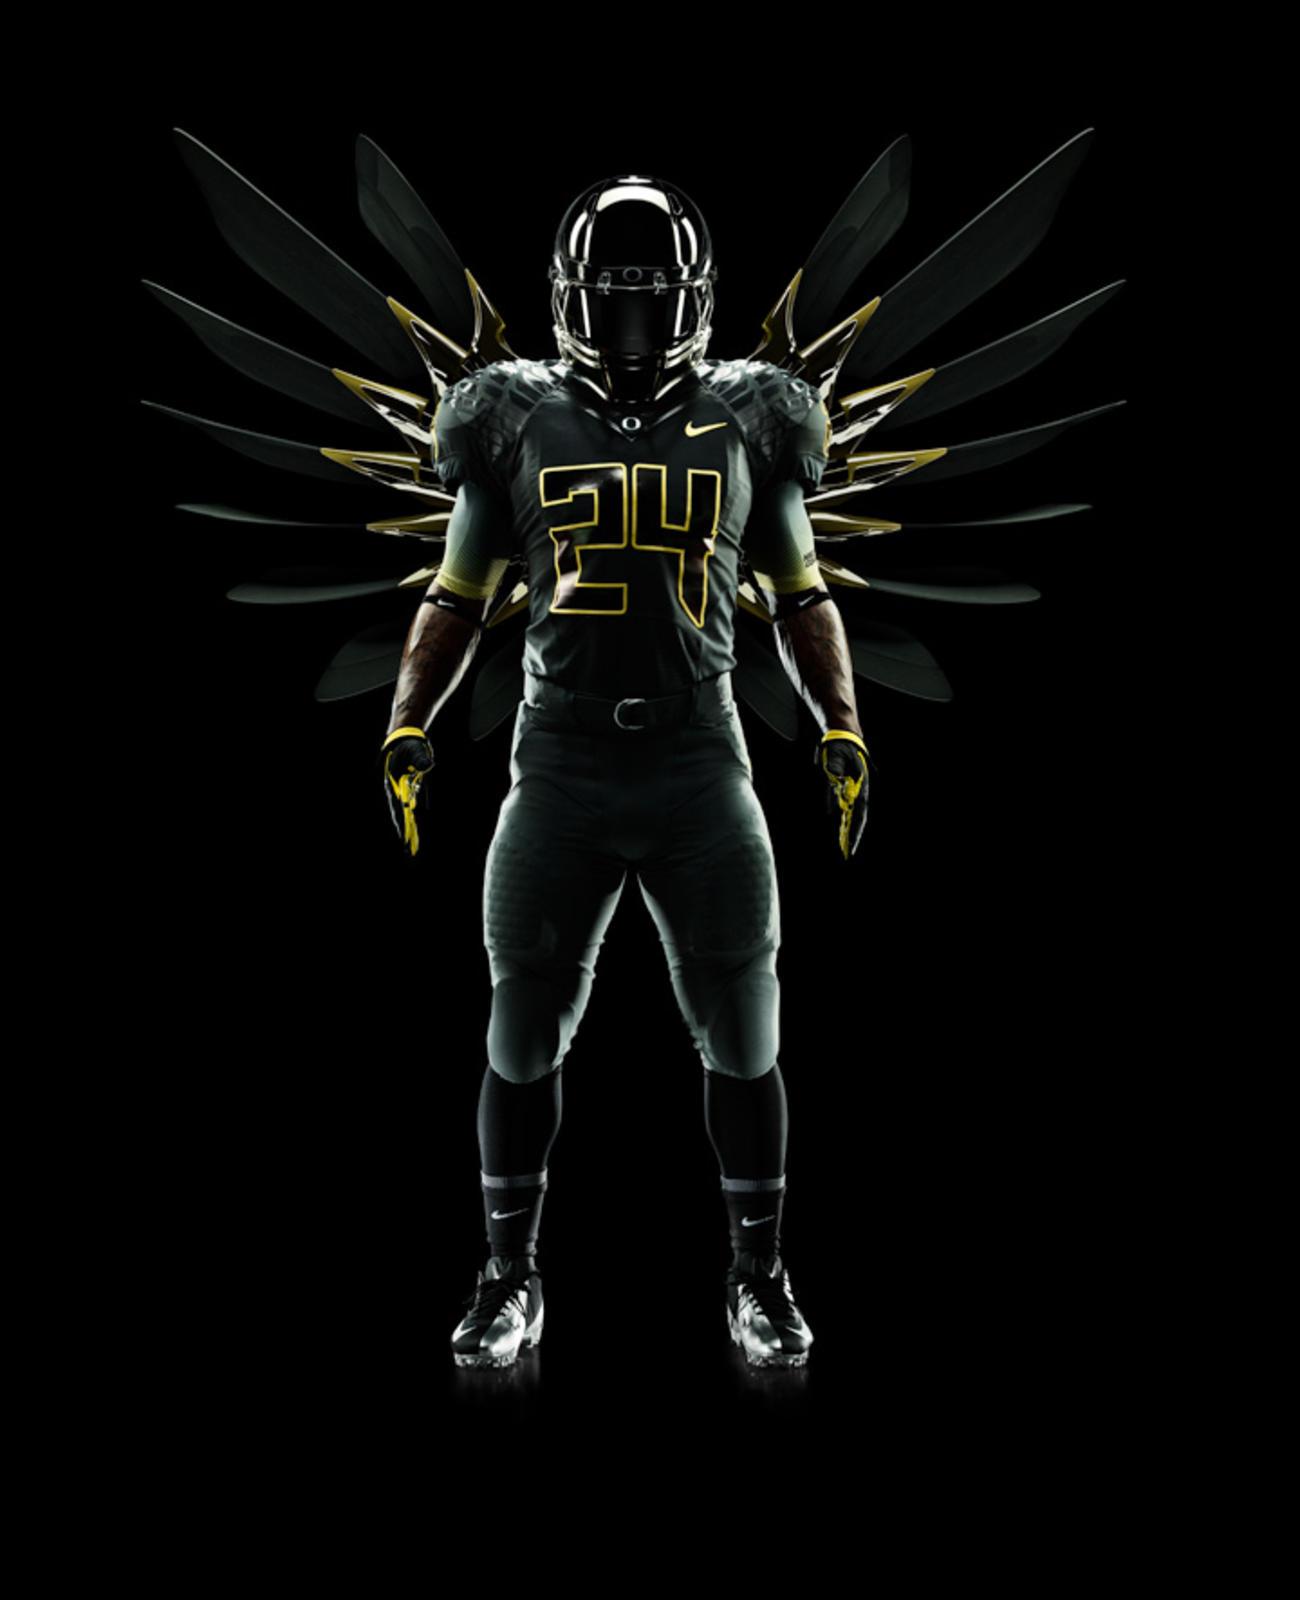 Oregon Ducks Backgrounds: Nike Unveils New Integrated Uniform System For Oregon